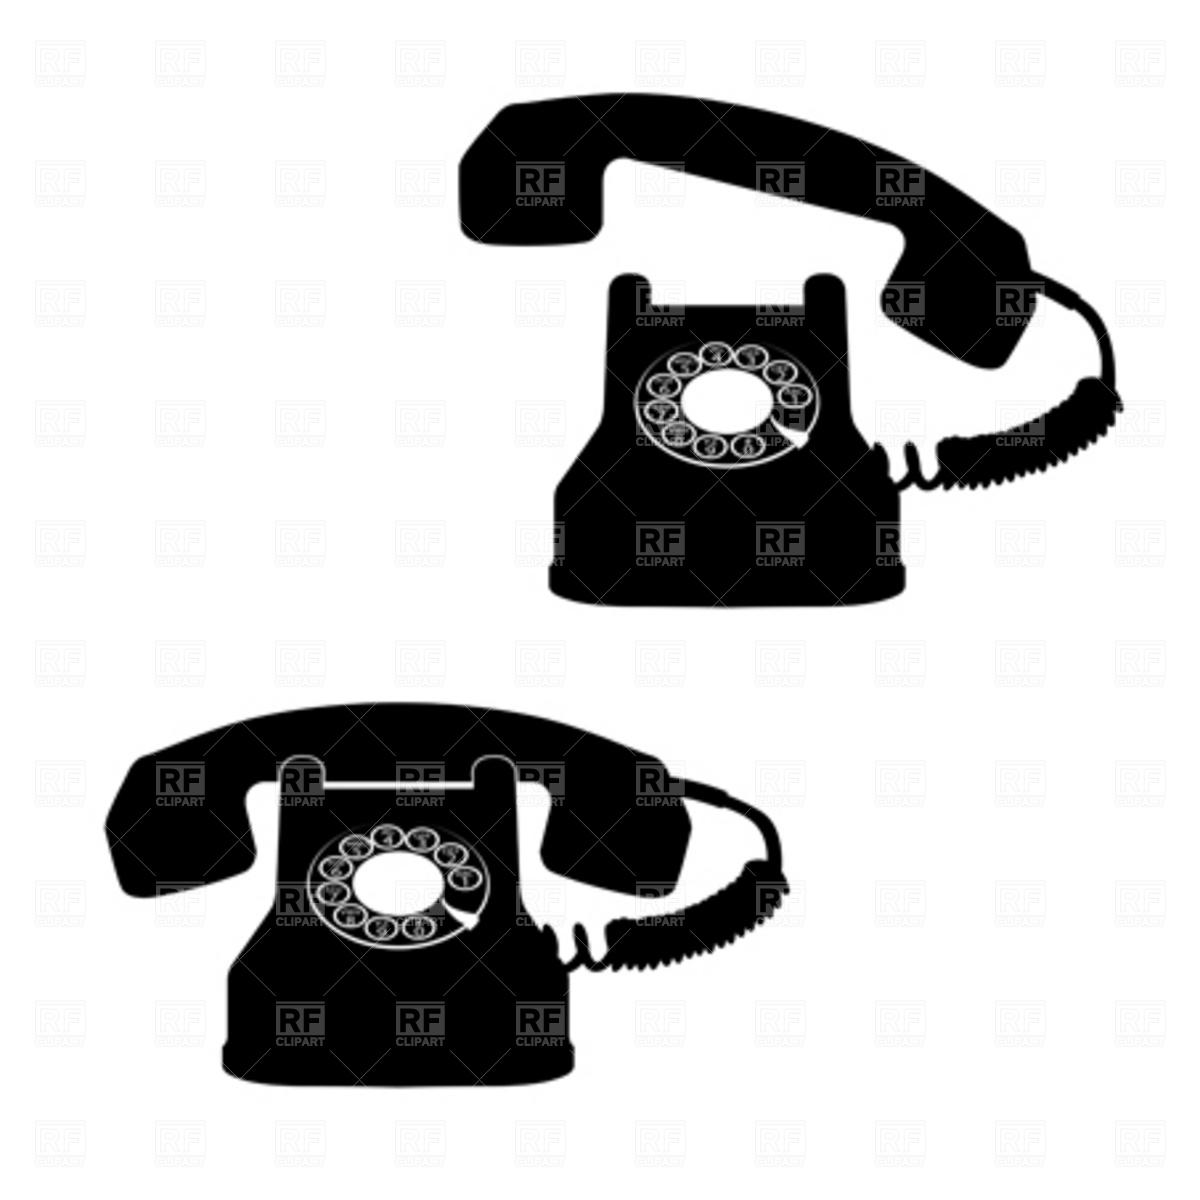 Retro Telephone Clipart.